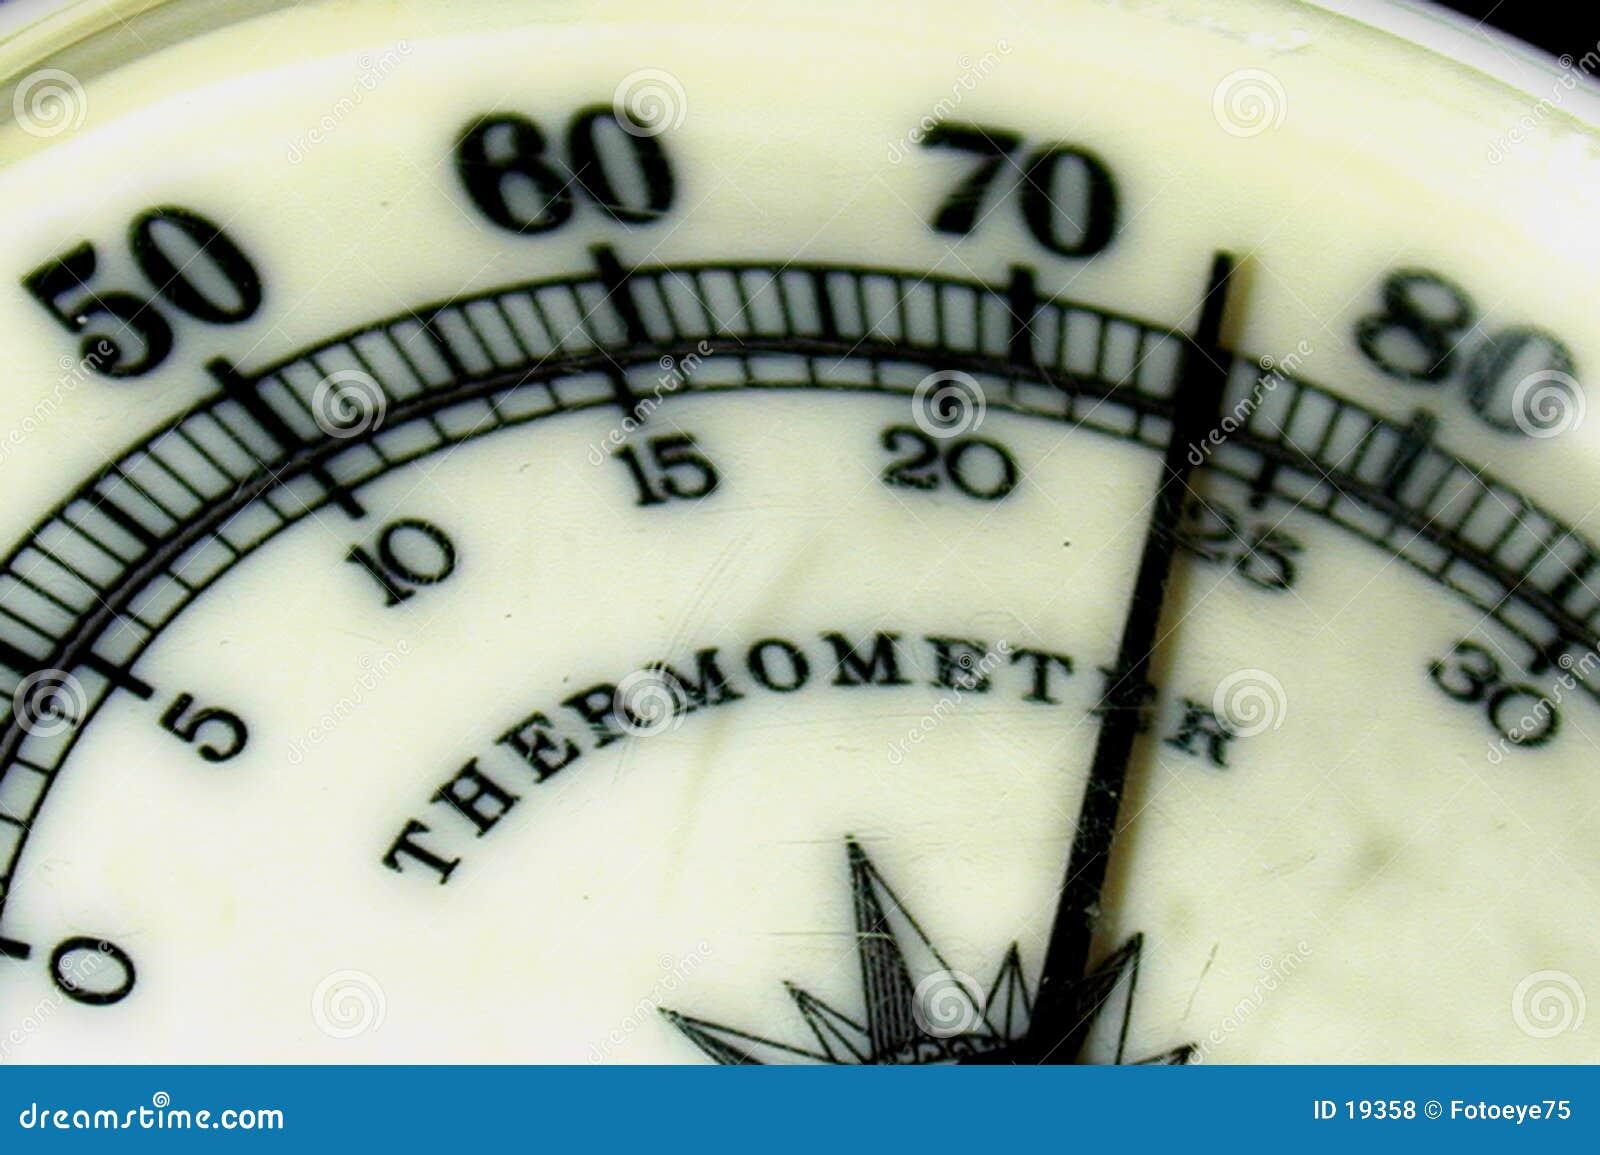 75 degrees